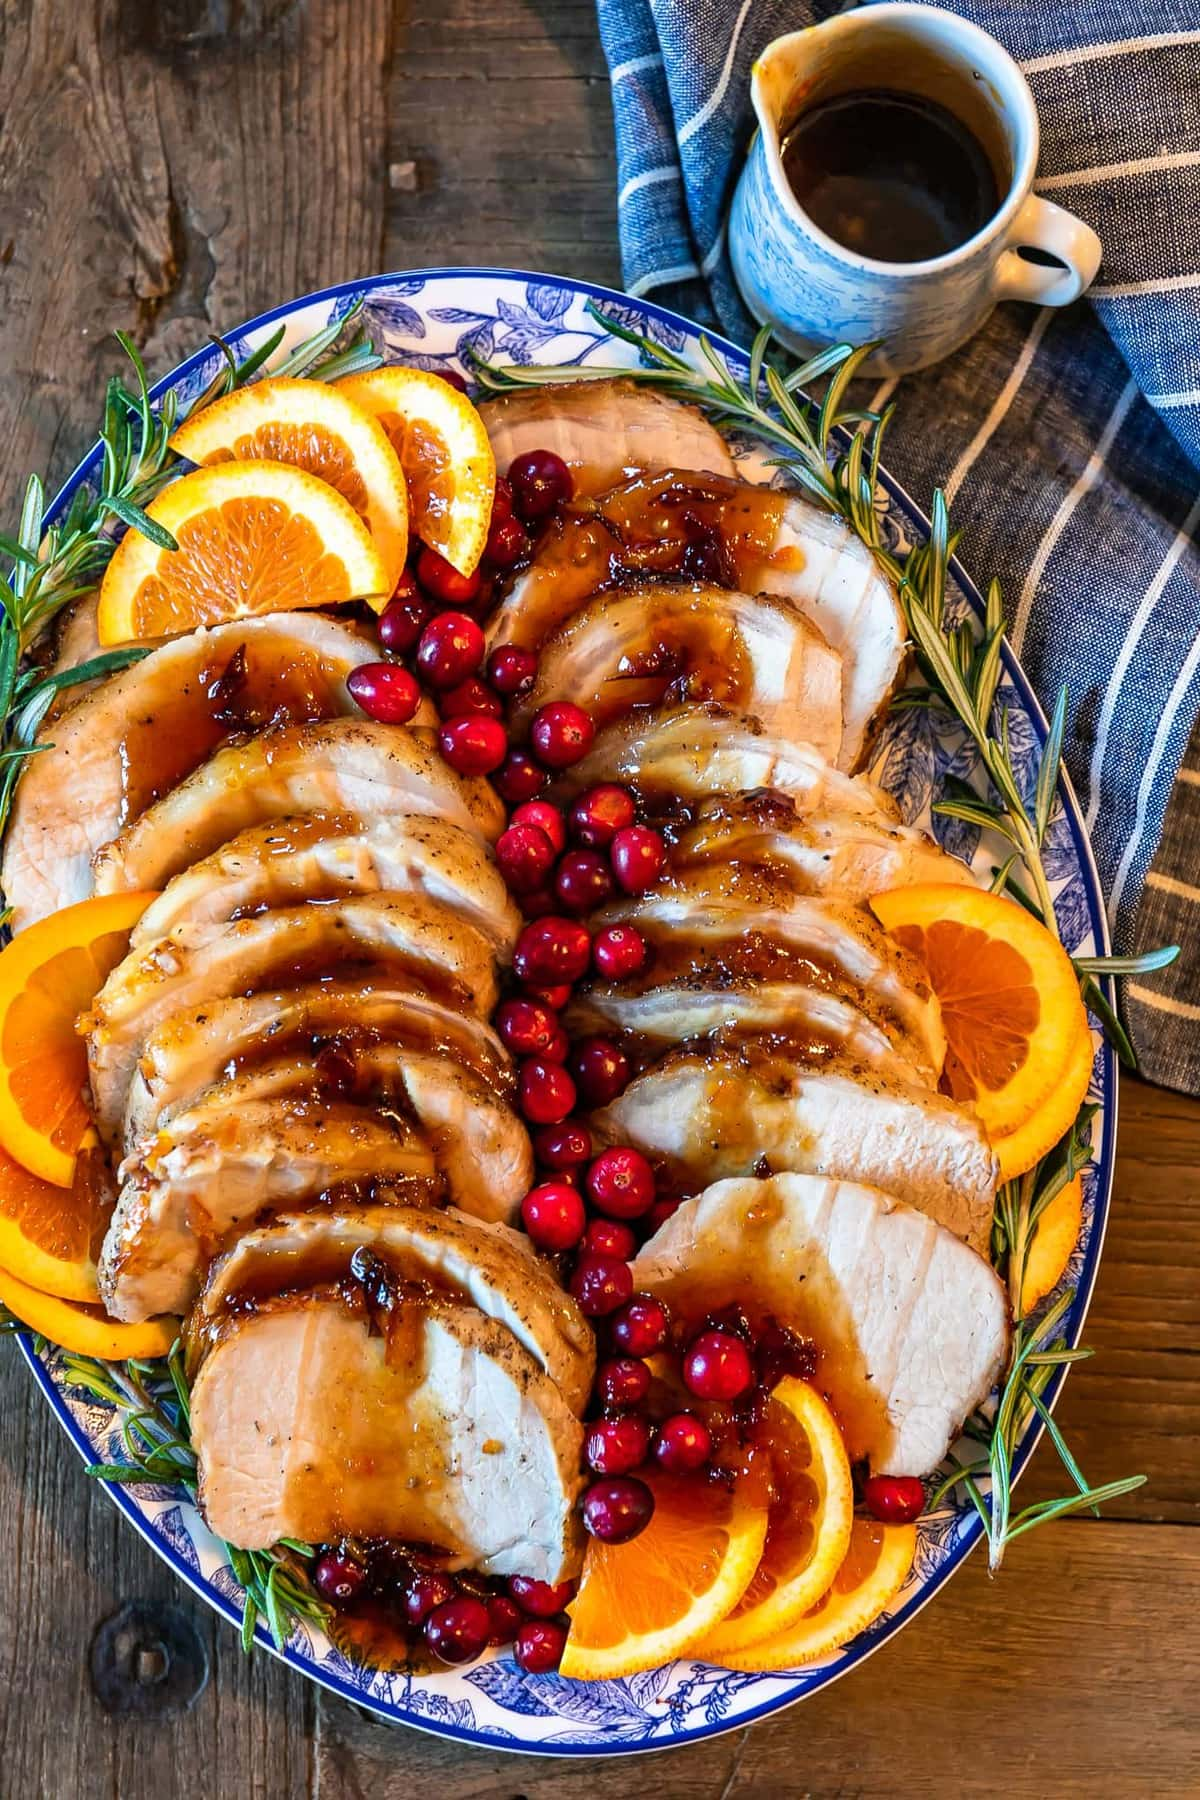 Easy Christmas dinner ideas: Orange Cranberry Pork Loin Roast